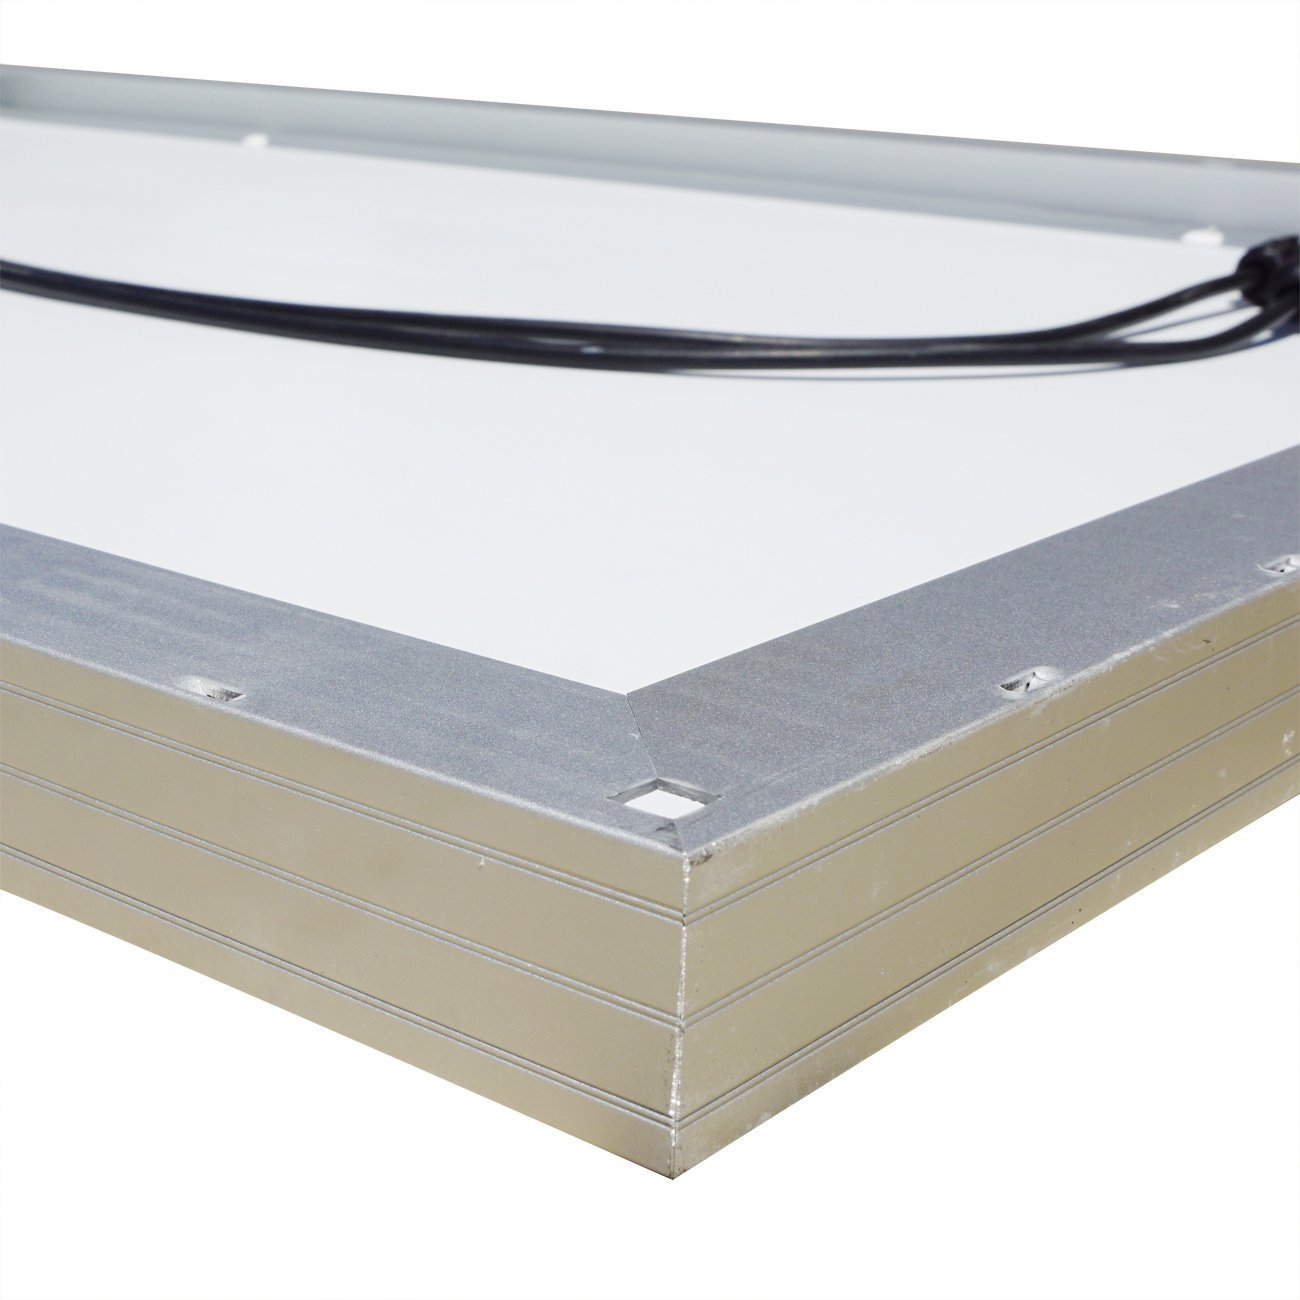 ECO-WORTHY 100 Watt Solar Panel 12 Volts Monocrystalline Solar Panel High Efficiency Mono Module RV Marine Boat Off Grid by ECO-WORTHY (Image #3)